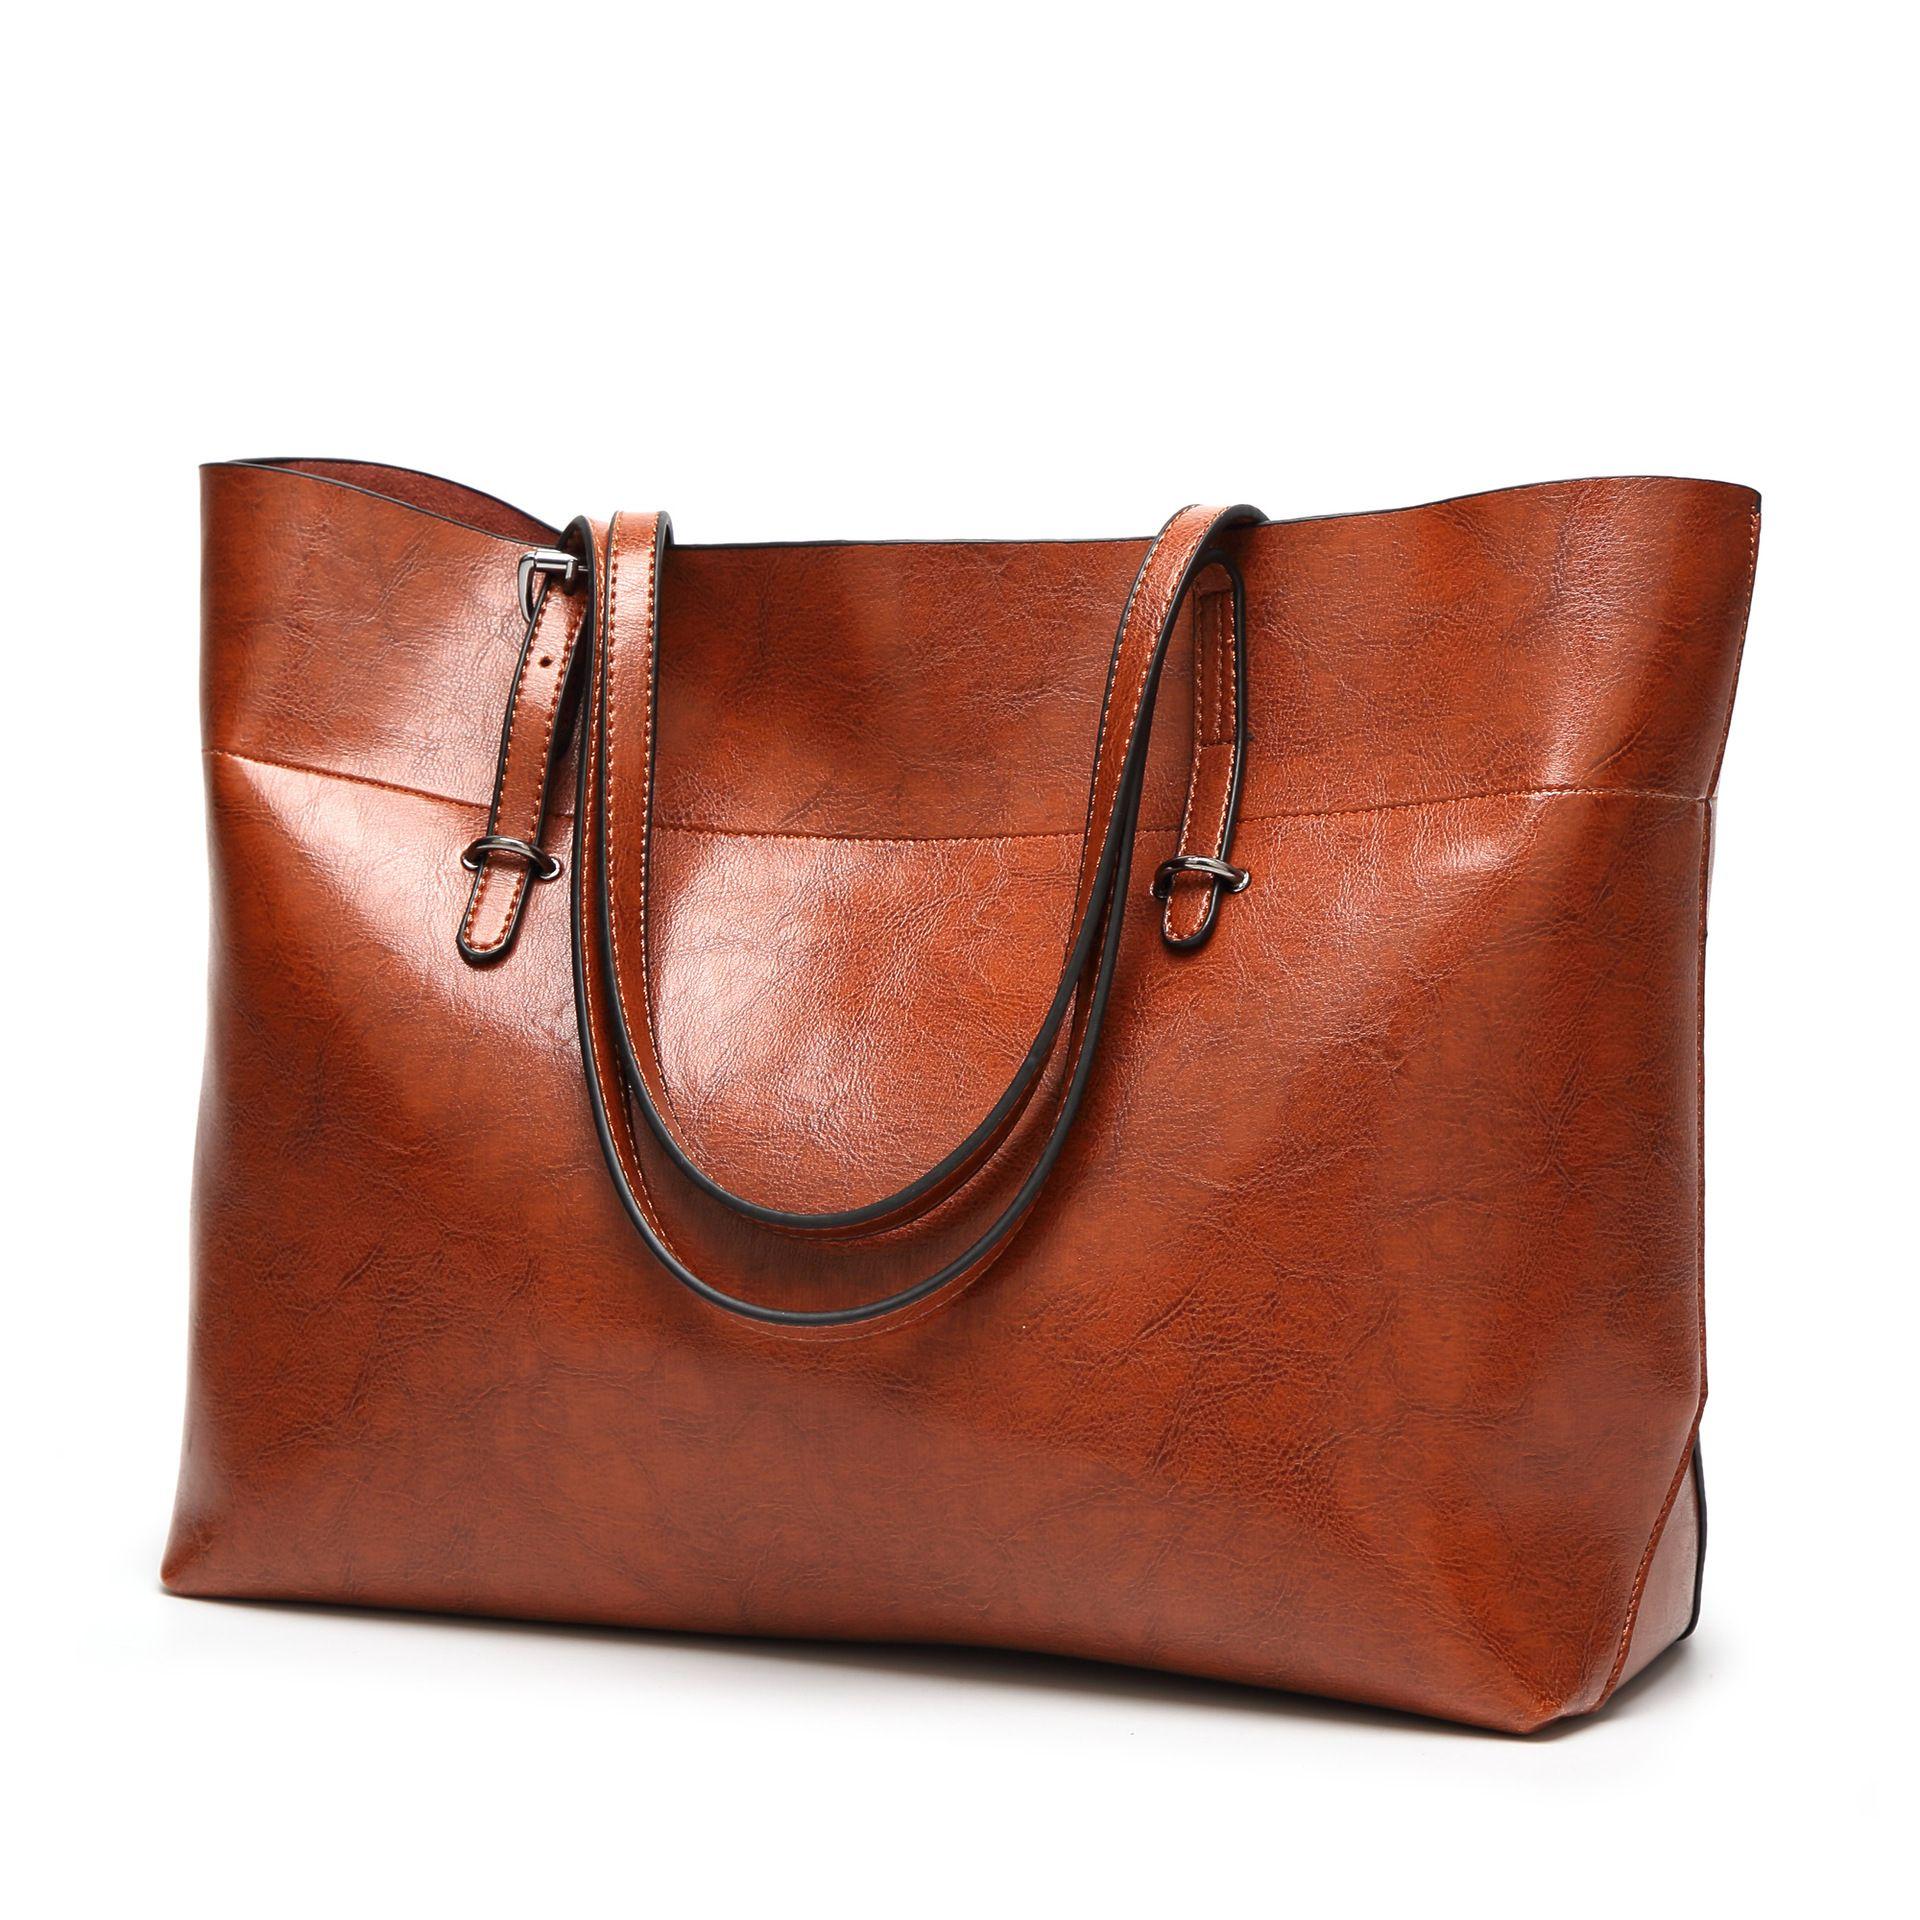 2018 new women's bag simple one-shoulder bag pu leather bucket bag cross version trend lady's handbag